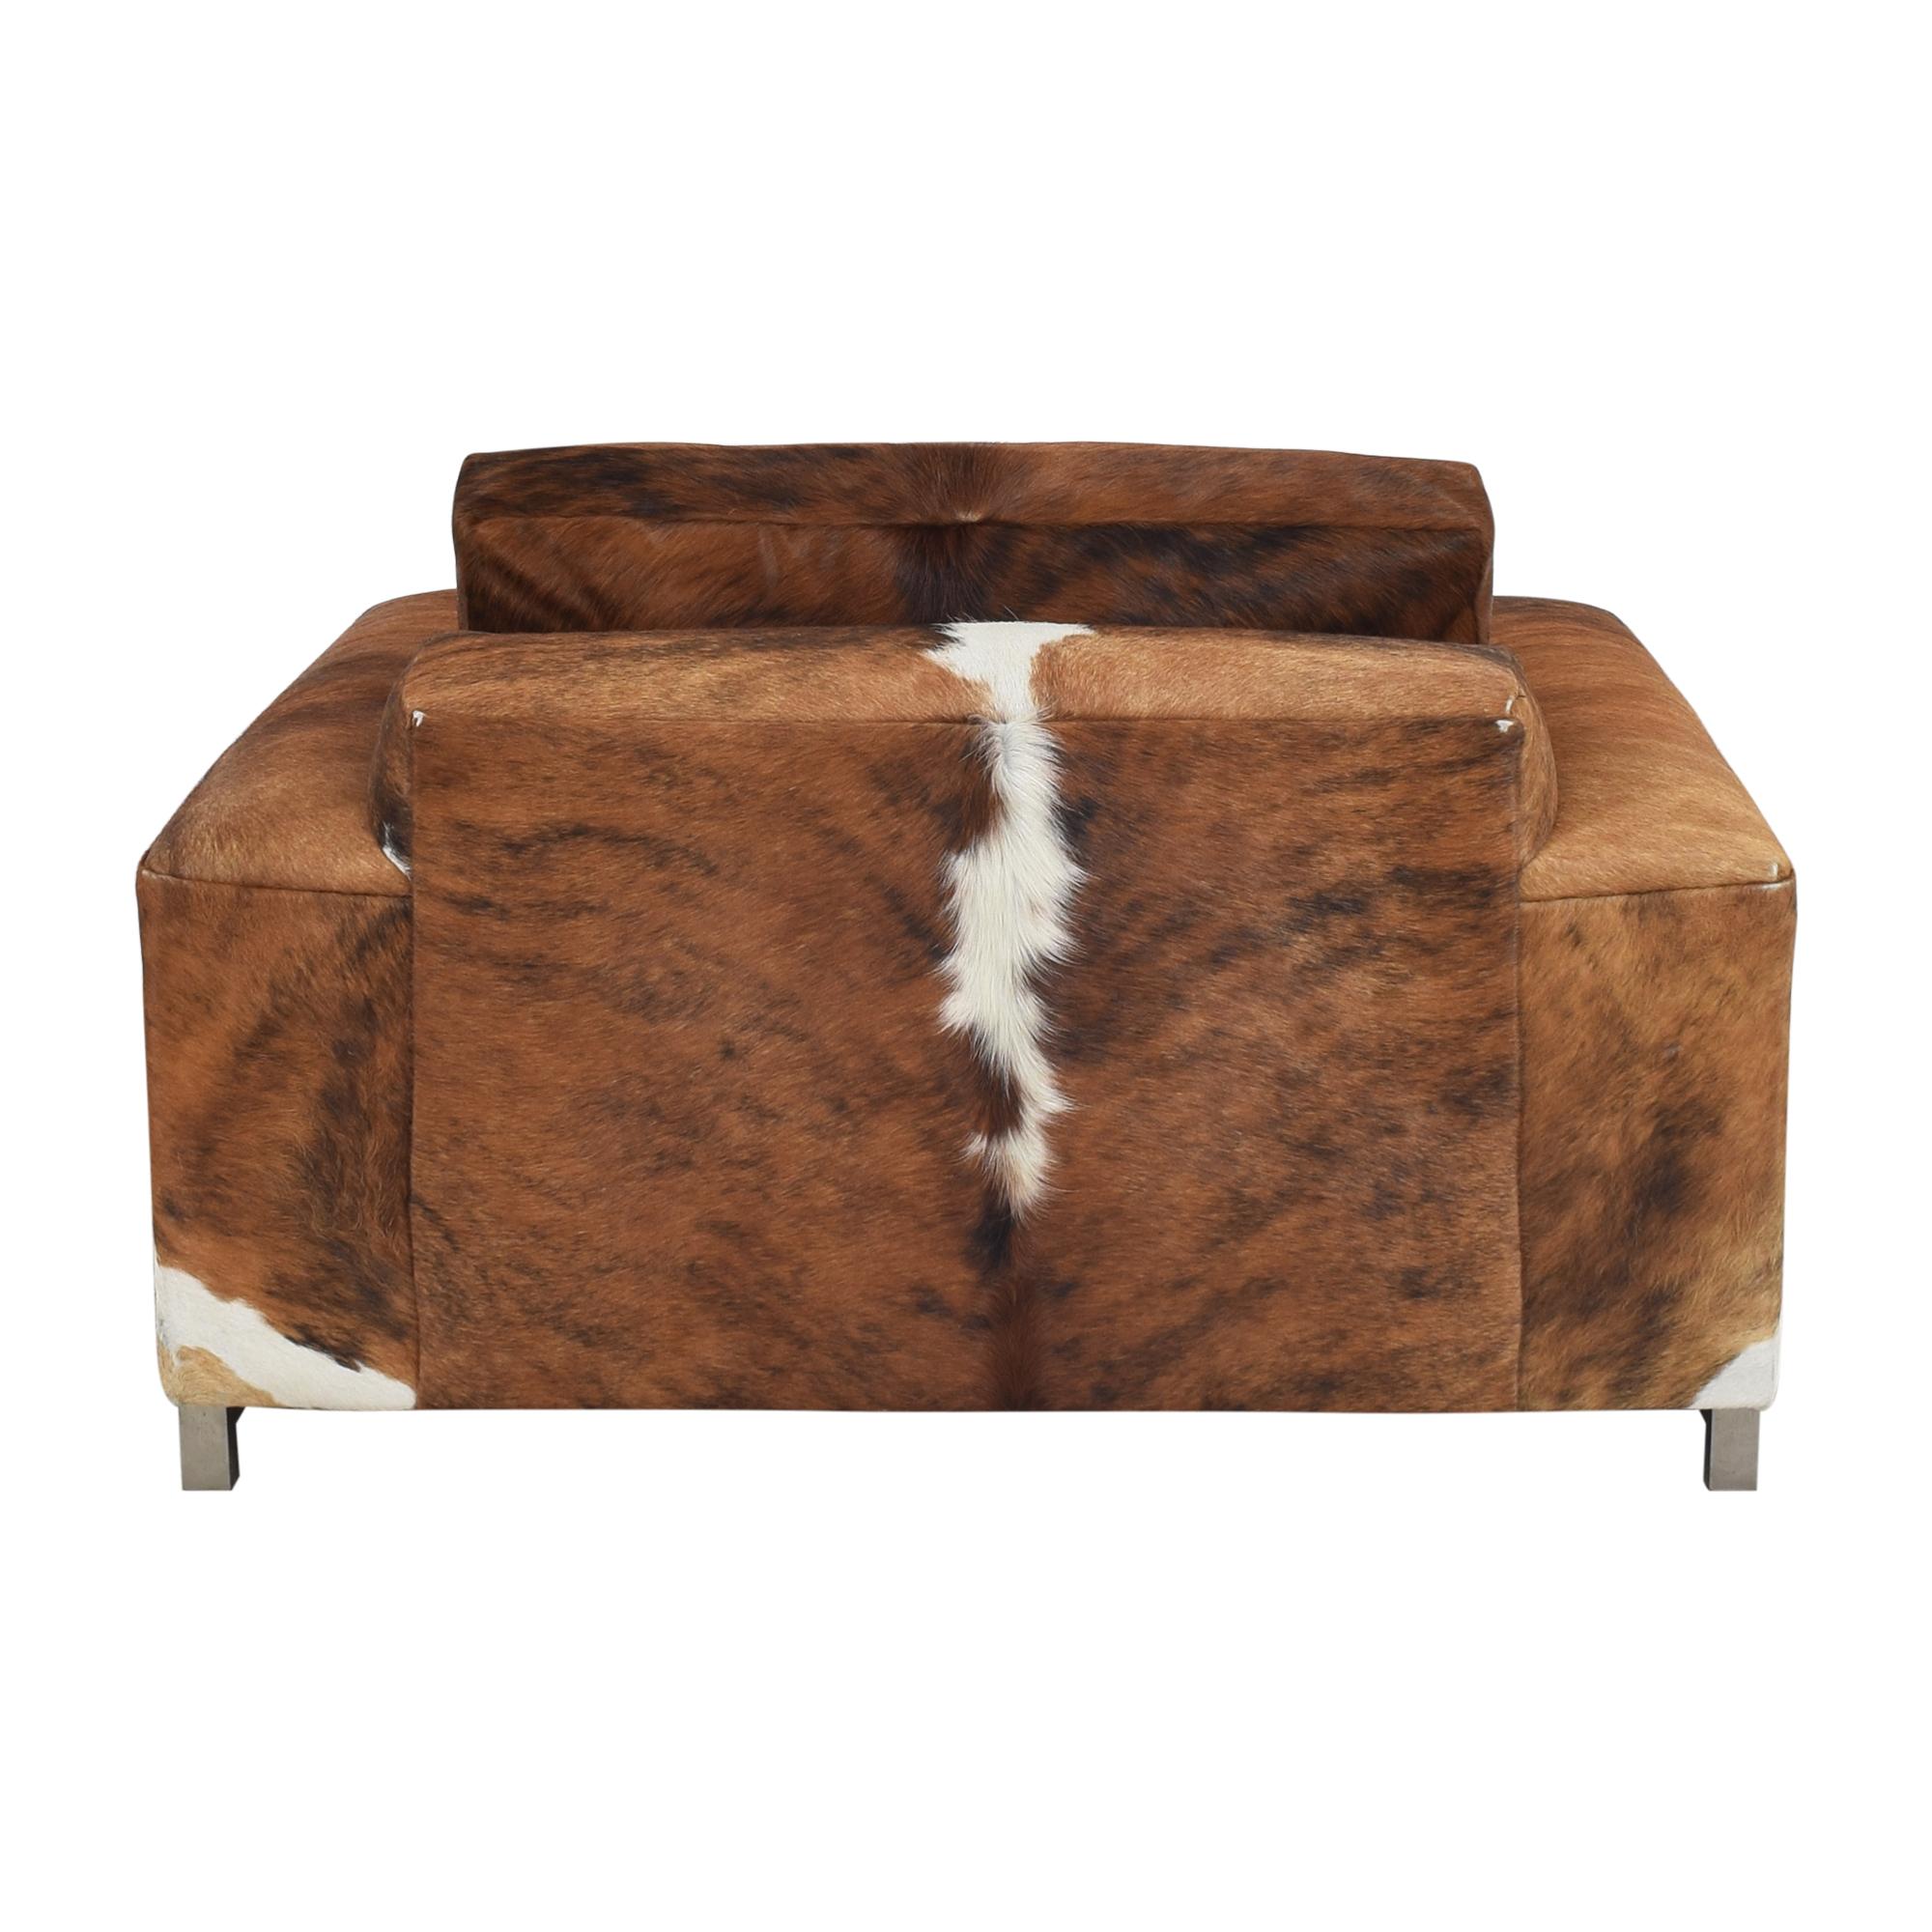 Room & Board Custom Room & Board Hide Lounge Chair nyc